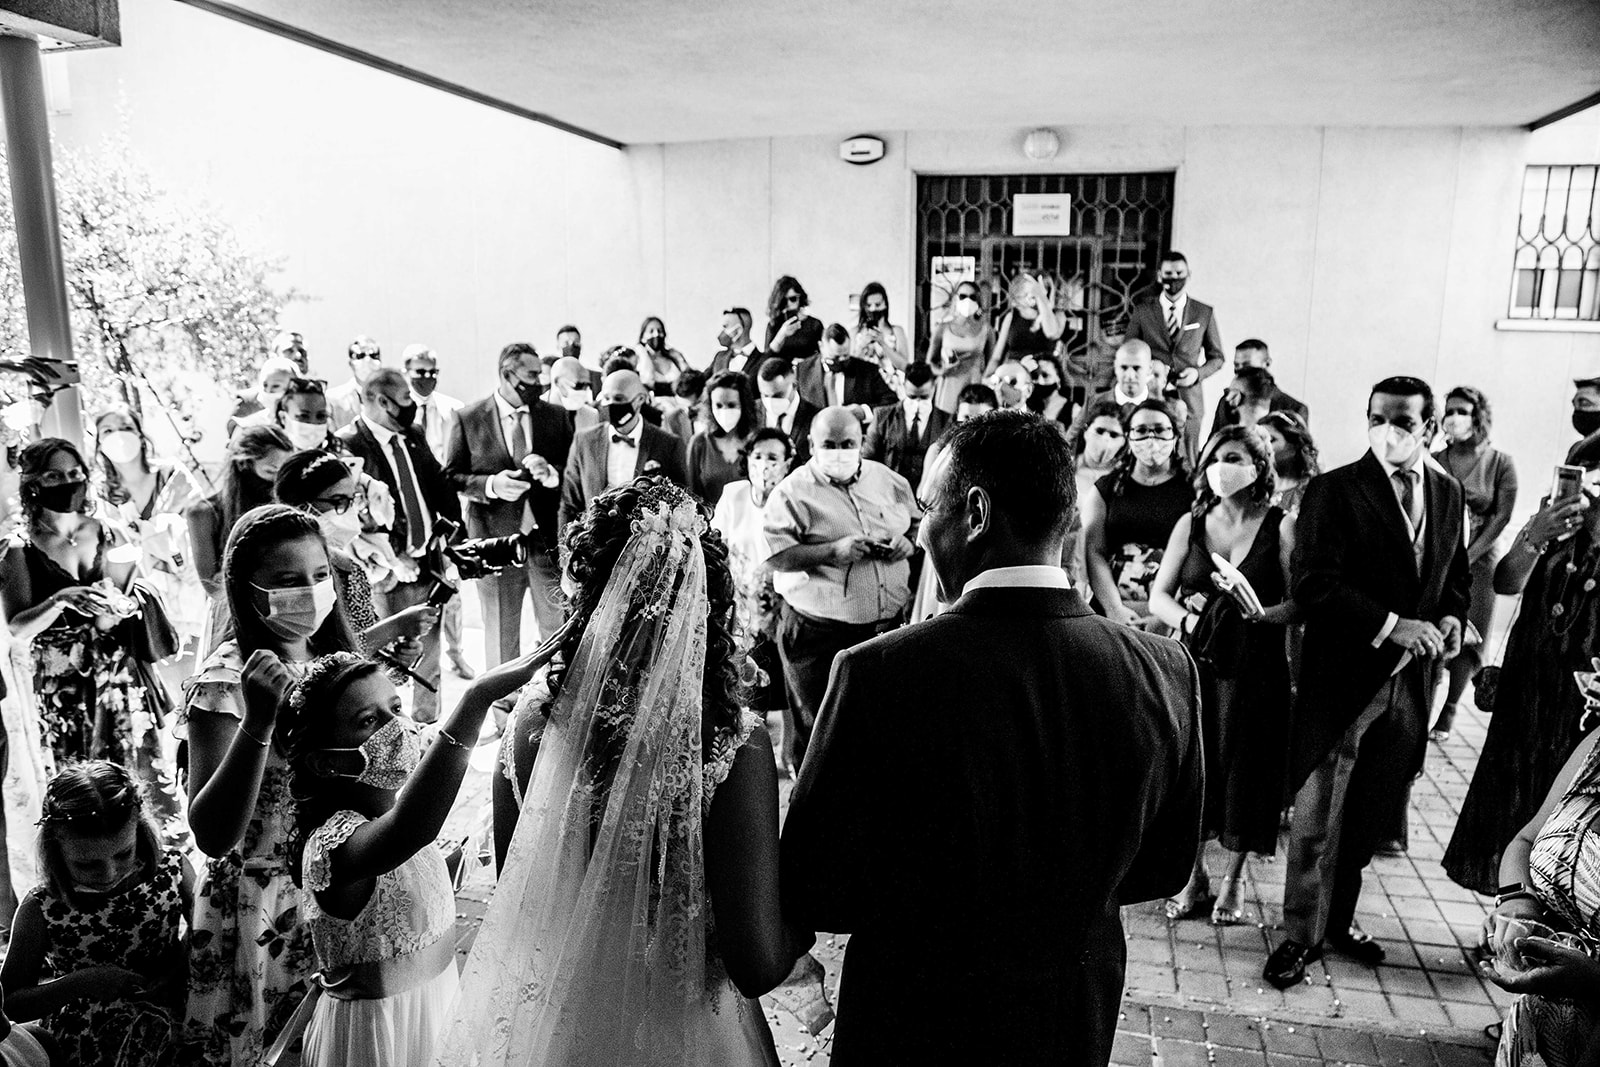 beso en la salida de la boda confeti